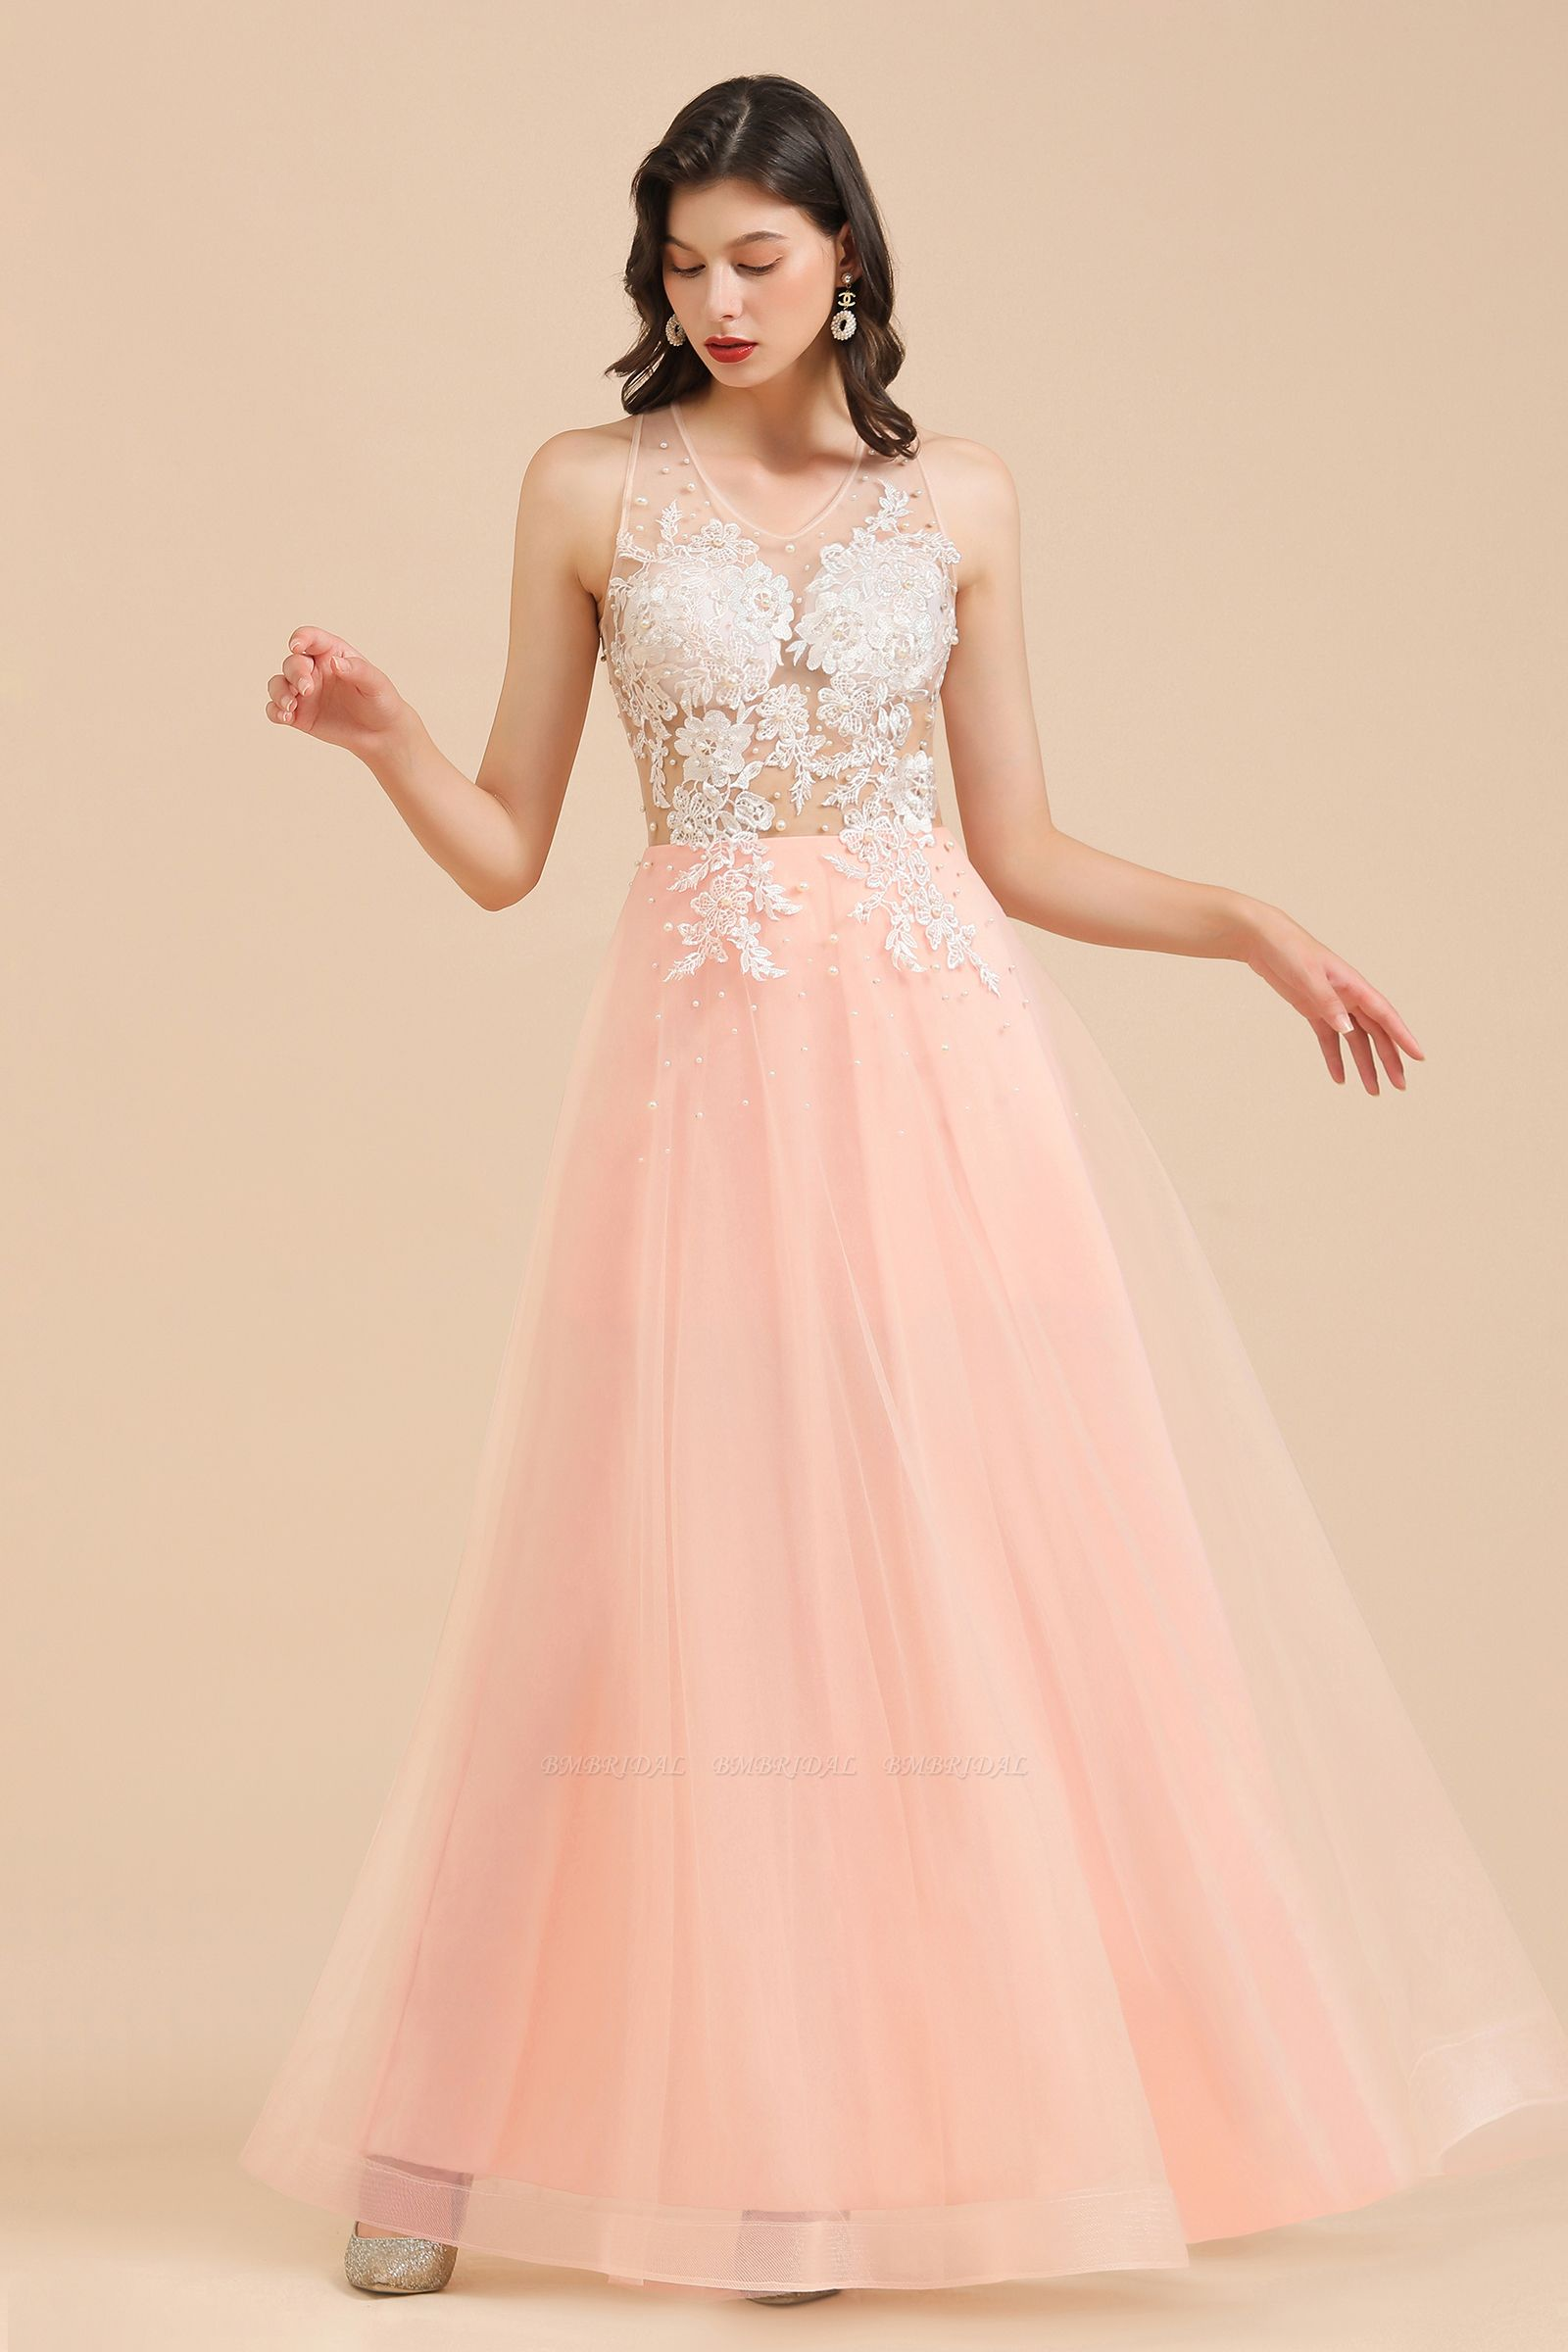 BMbridal Round Neck Lace Appliques Long Evening Prom Dress